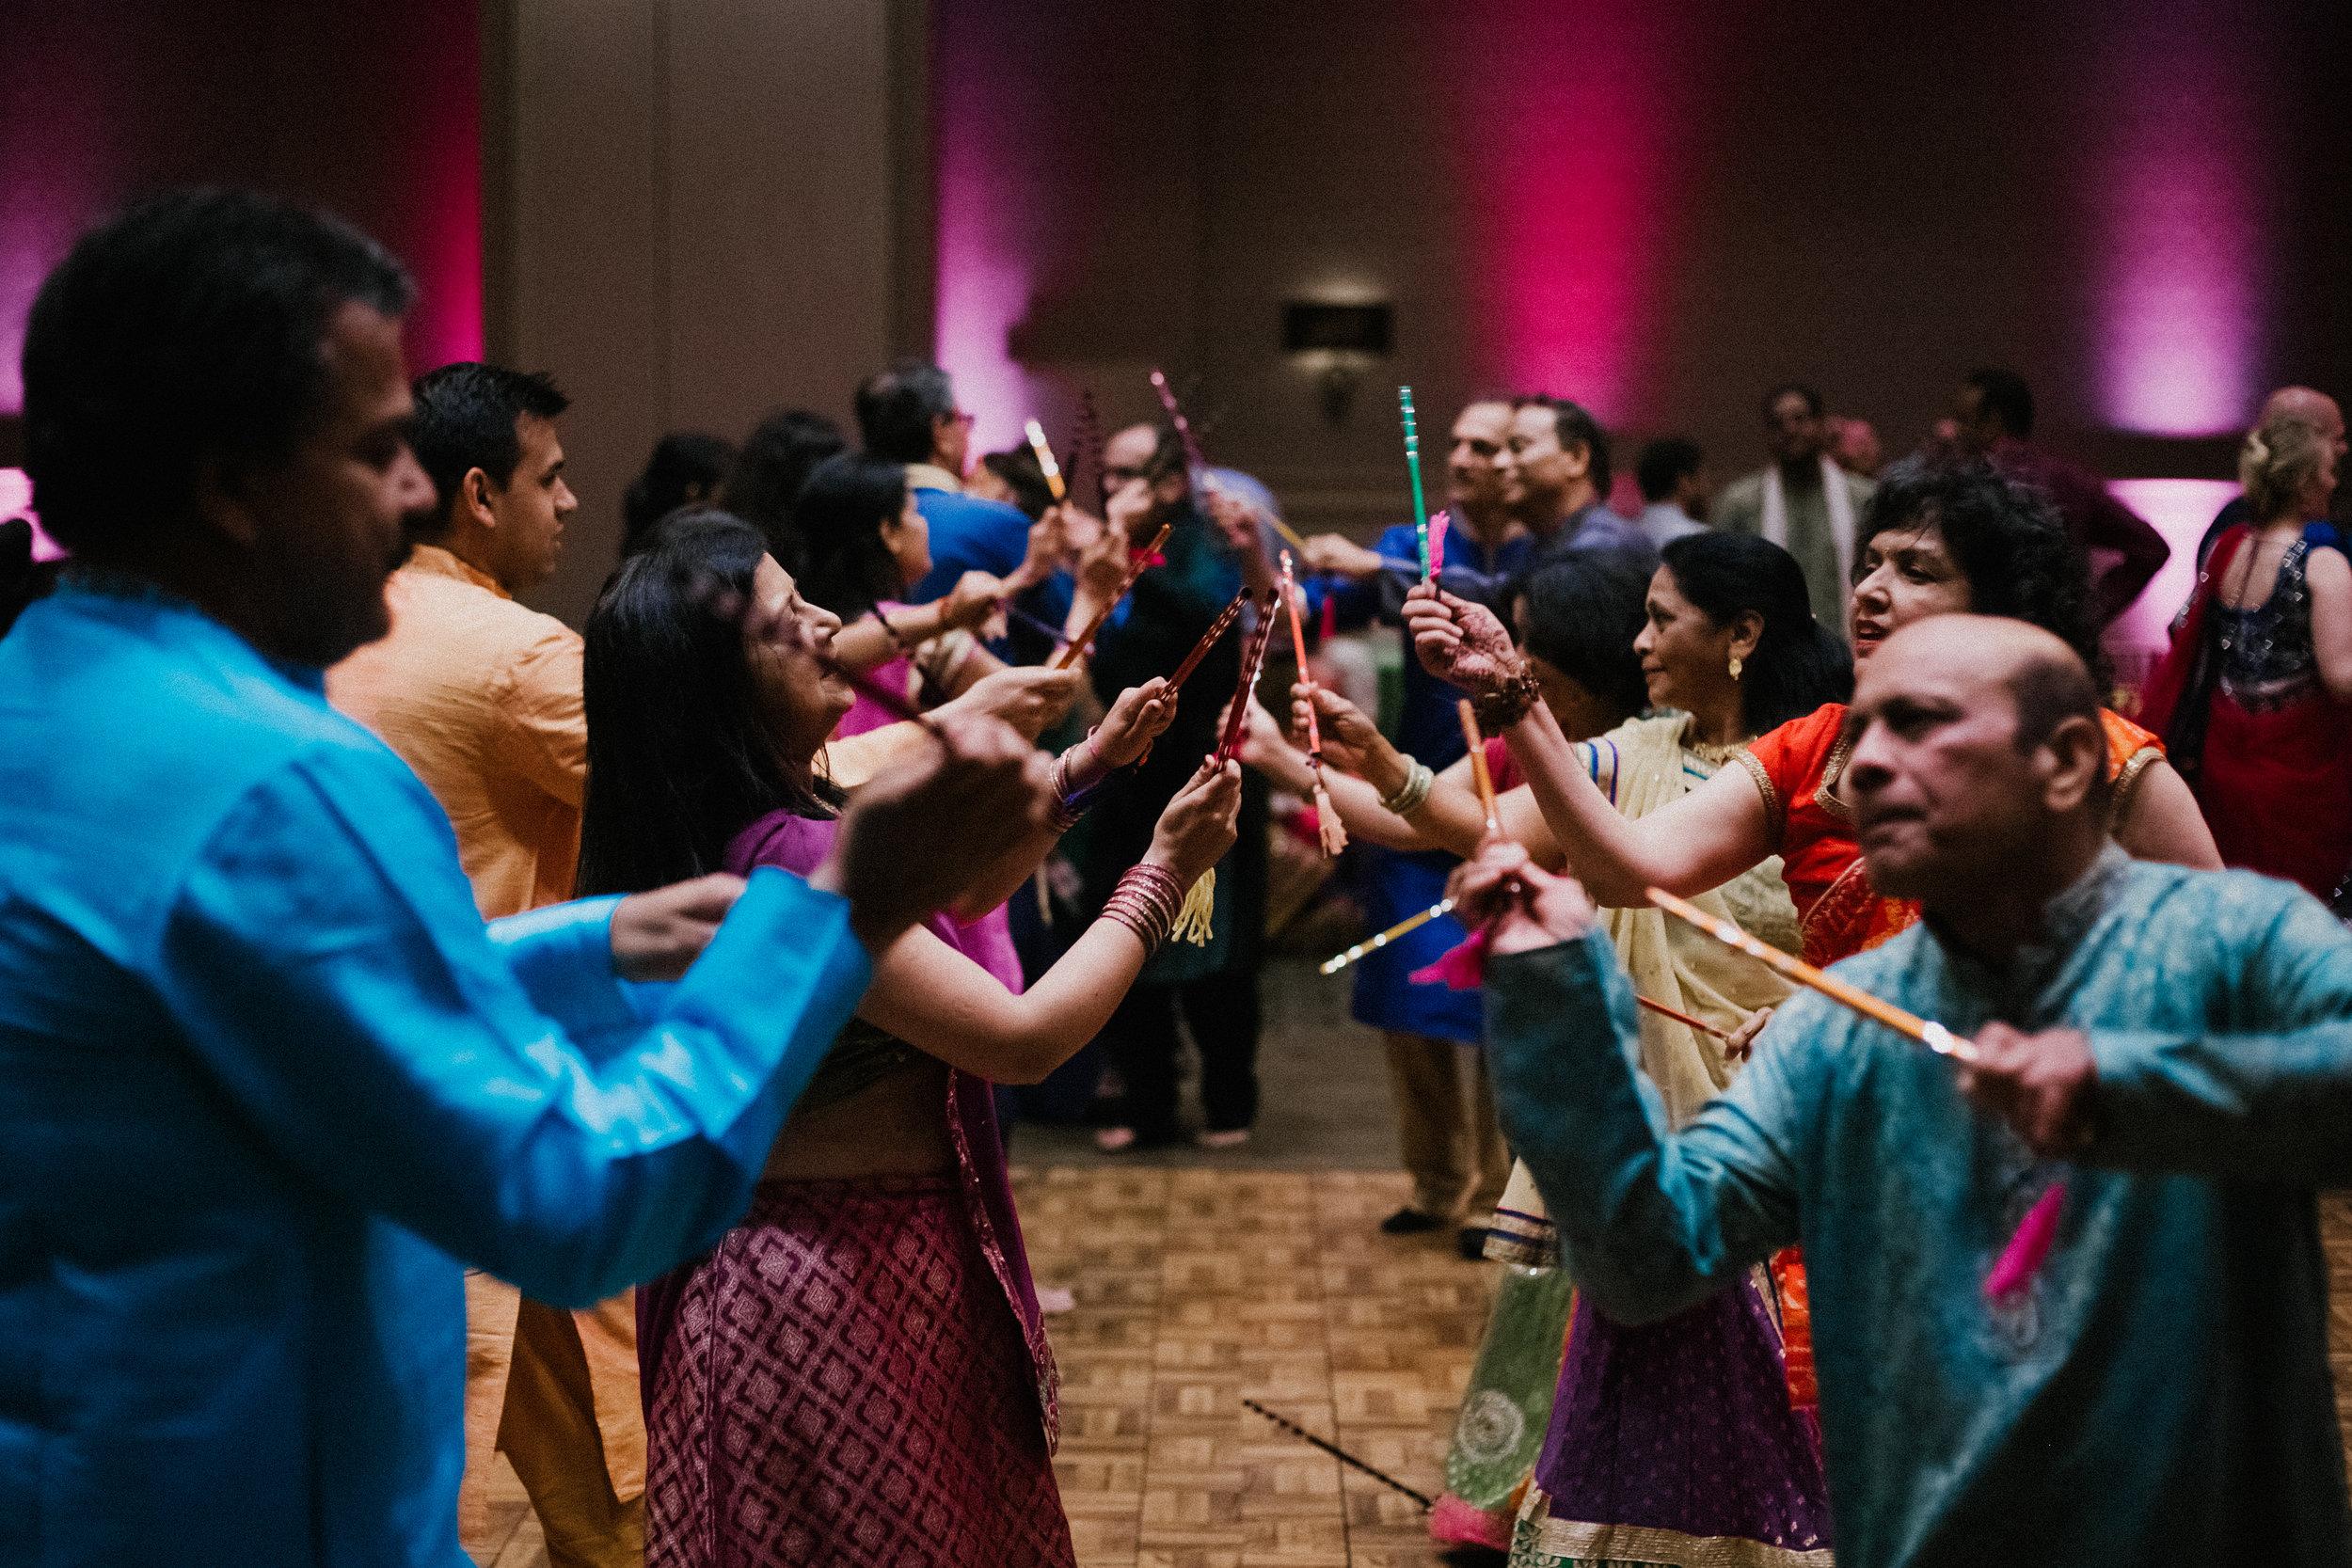 Aparna-Ankit-Patel-Shah-Detroit-Michigan-Shadow-Shine-Pictures-Photographers-Indian-Garba-Raas